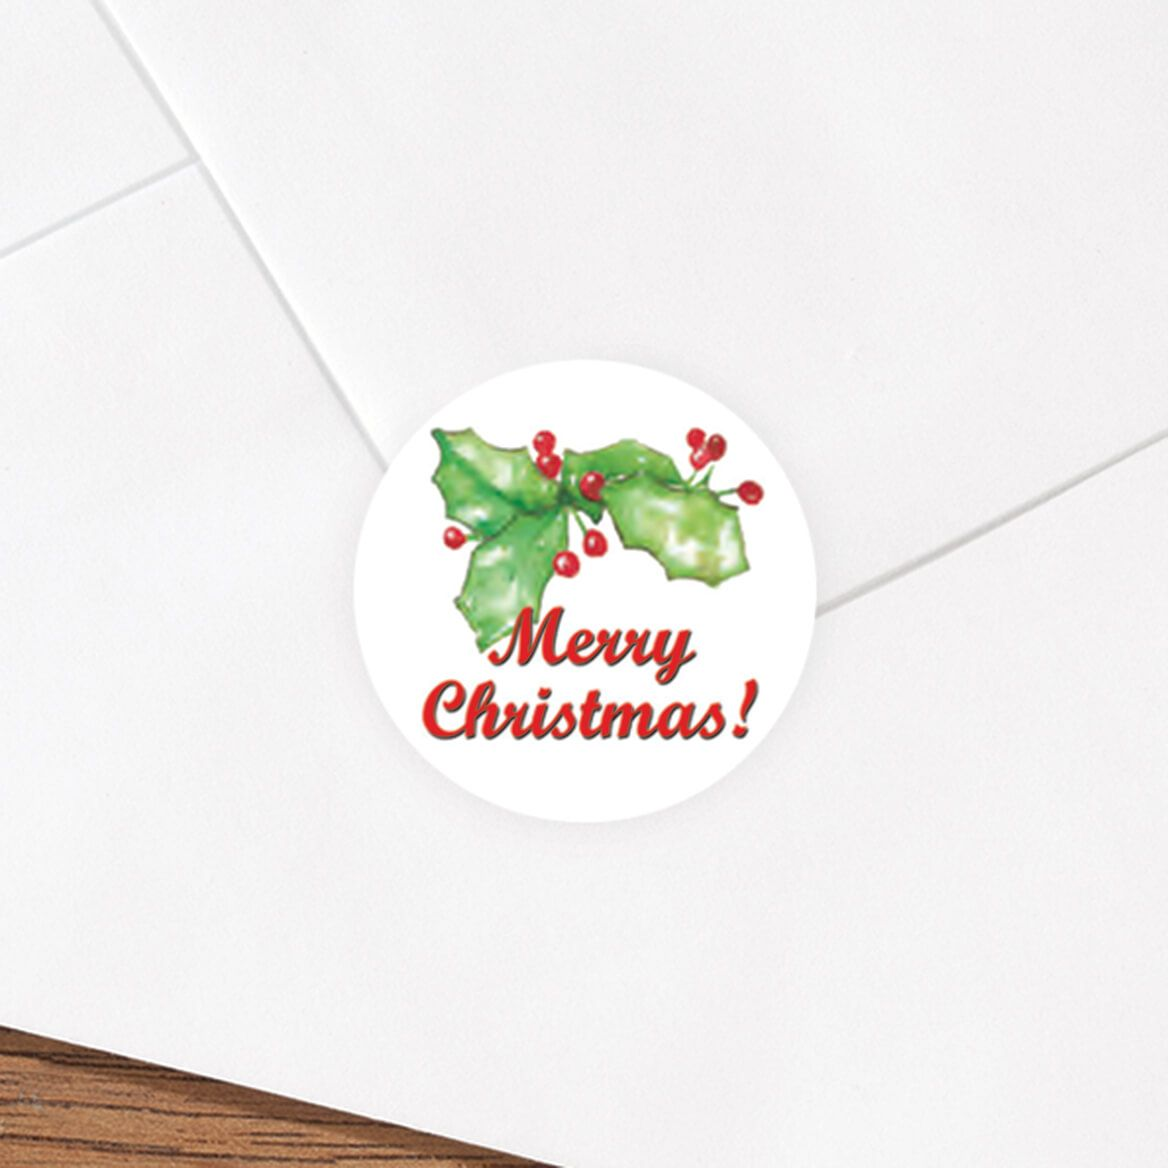 Merry Christmas Envelope Seals Set of 250-325251